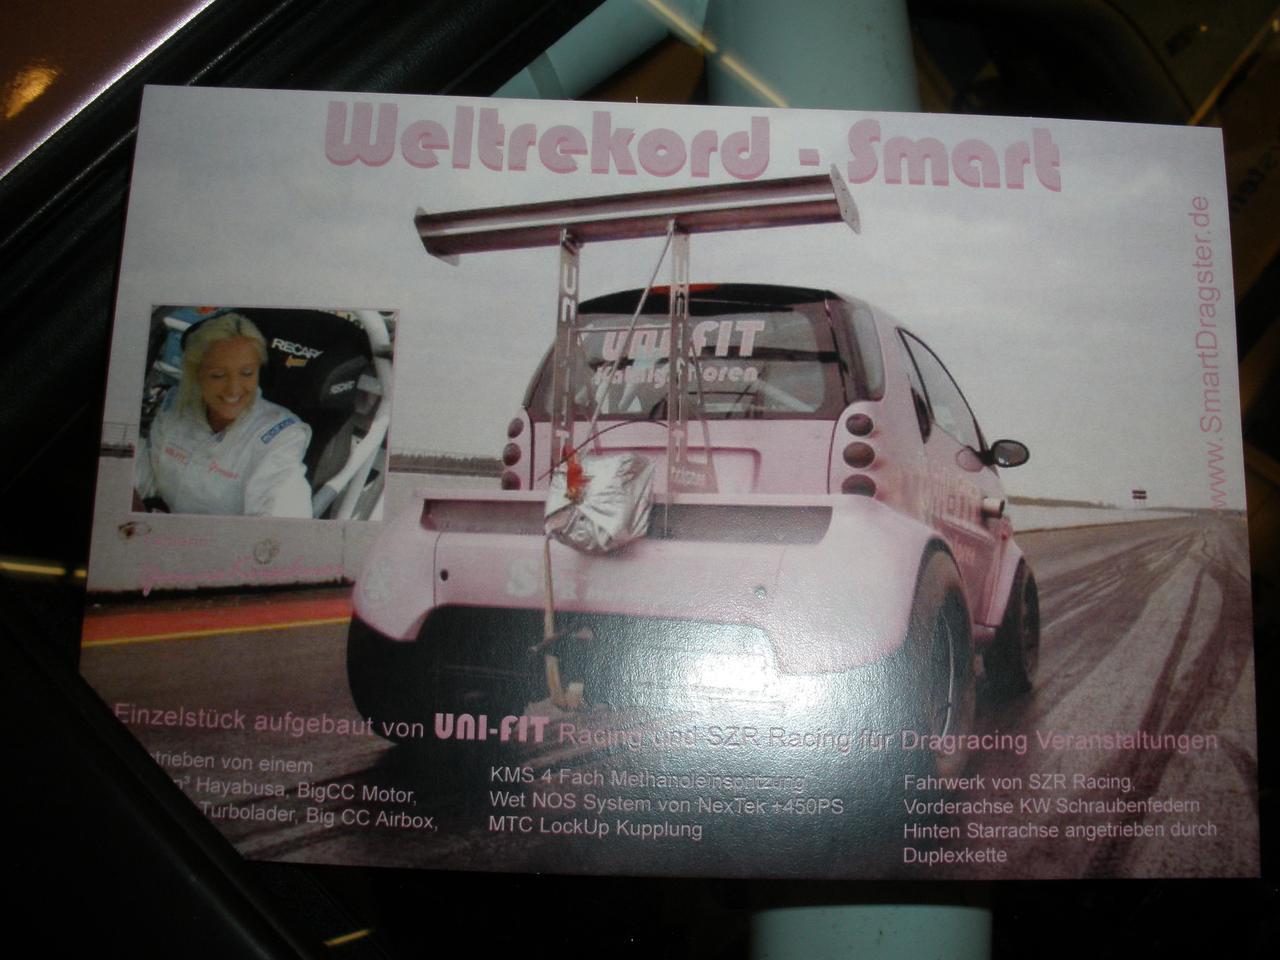 The world champion smartcar uses a Suzuki Hayabusa motor